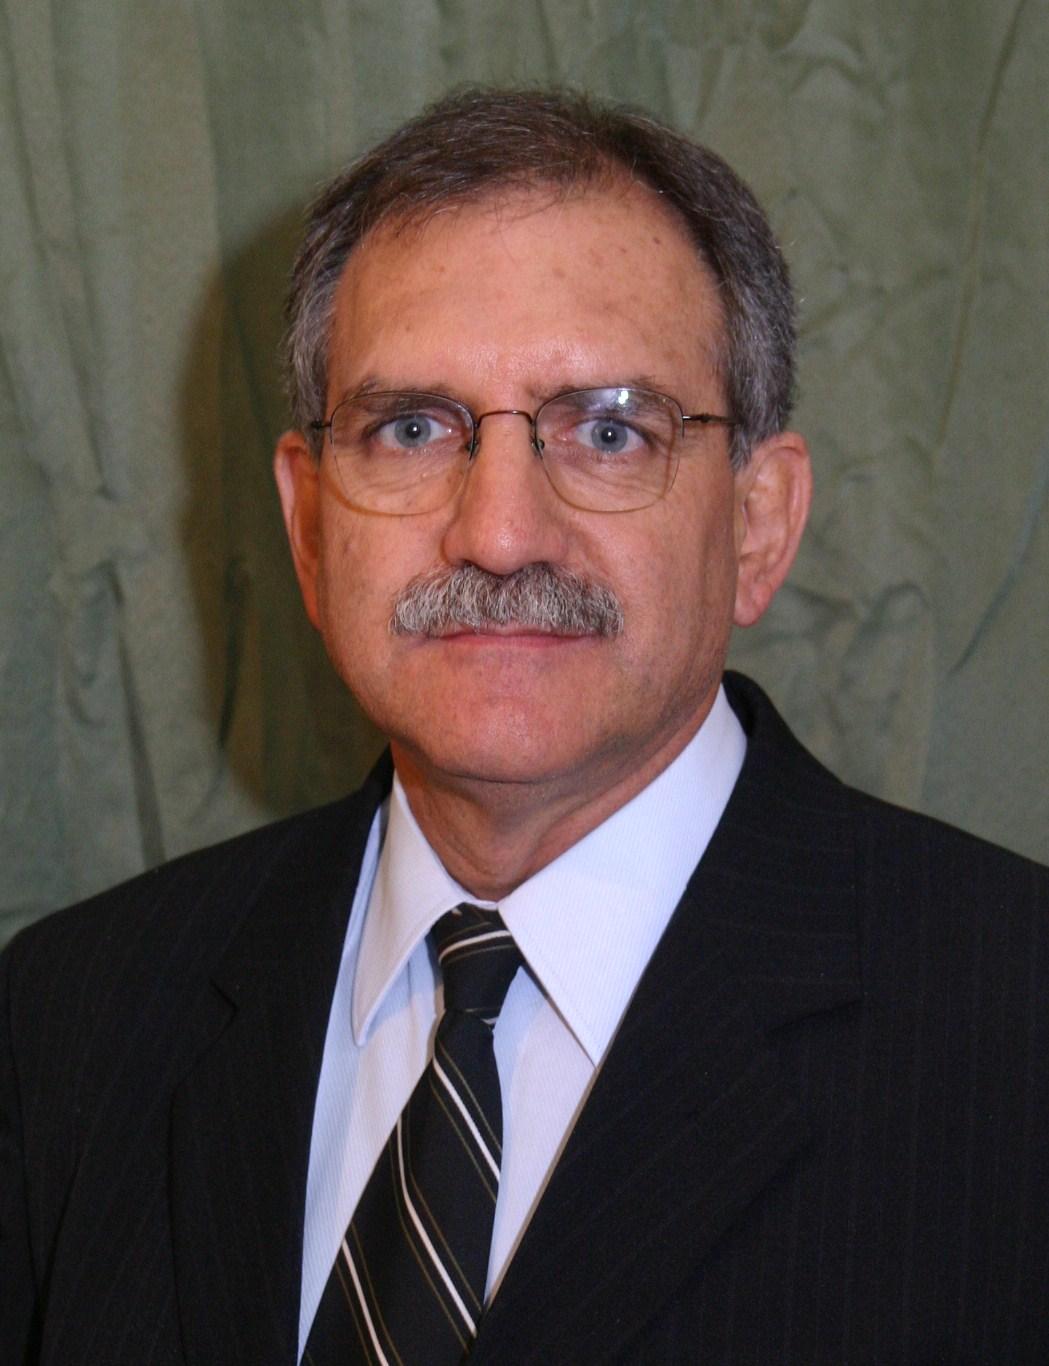 Ivo Carraro 2010